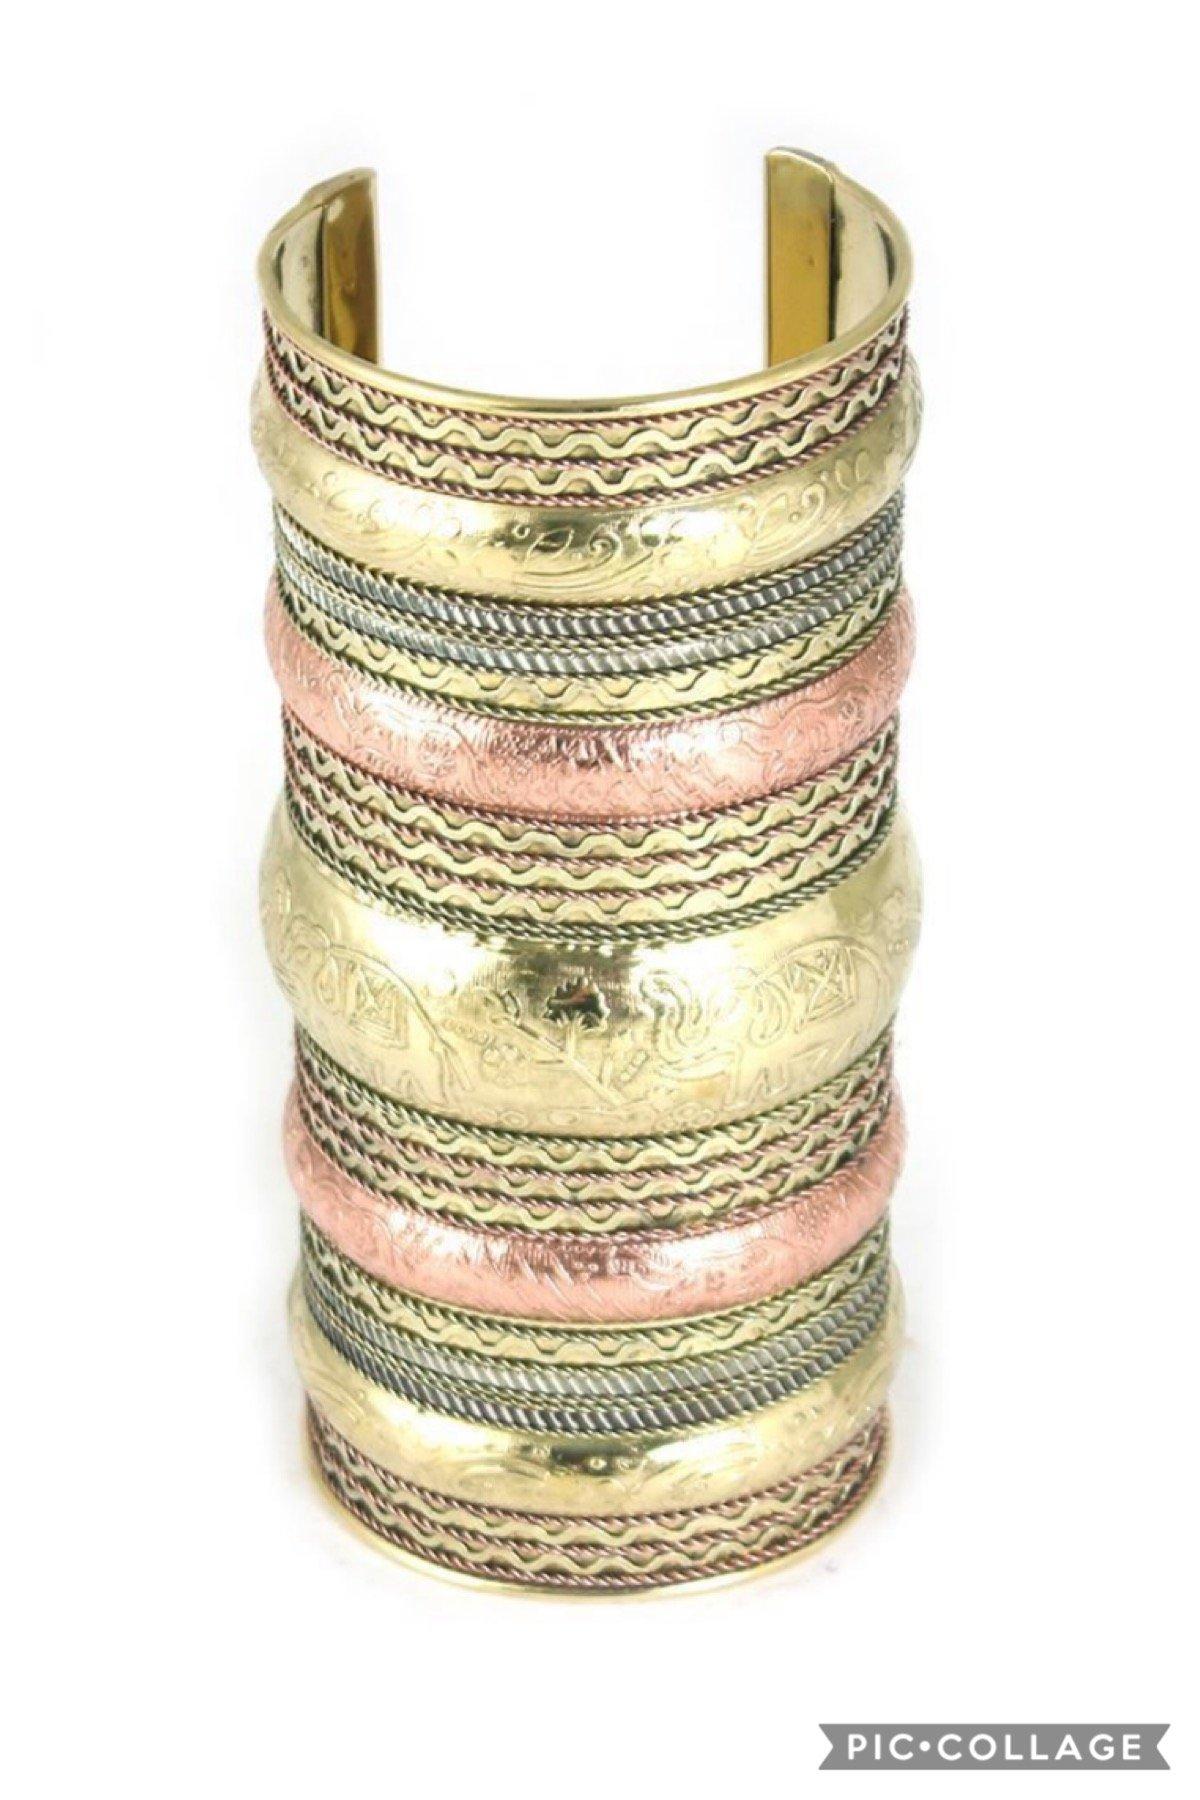 Image of Elephant Cuff: Copper/Brass